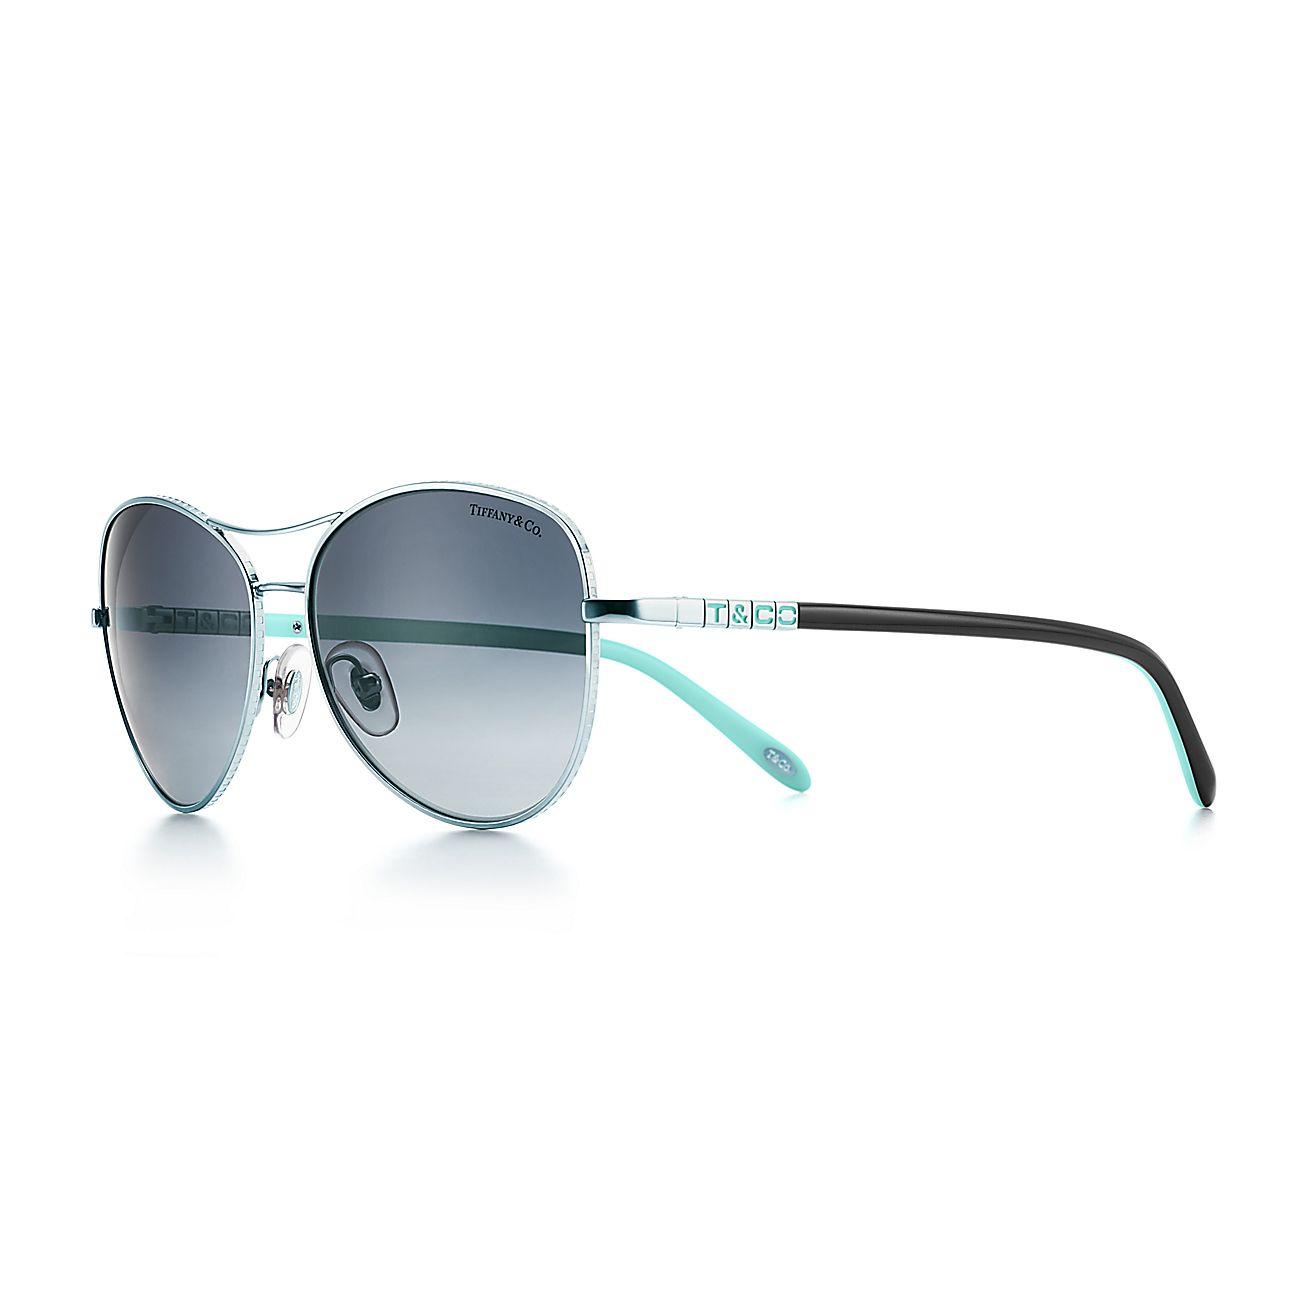 Tiffany Era Aviator Sunglasses In Silver Colored Metal With Polarized Lenses